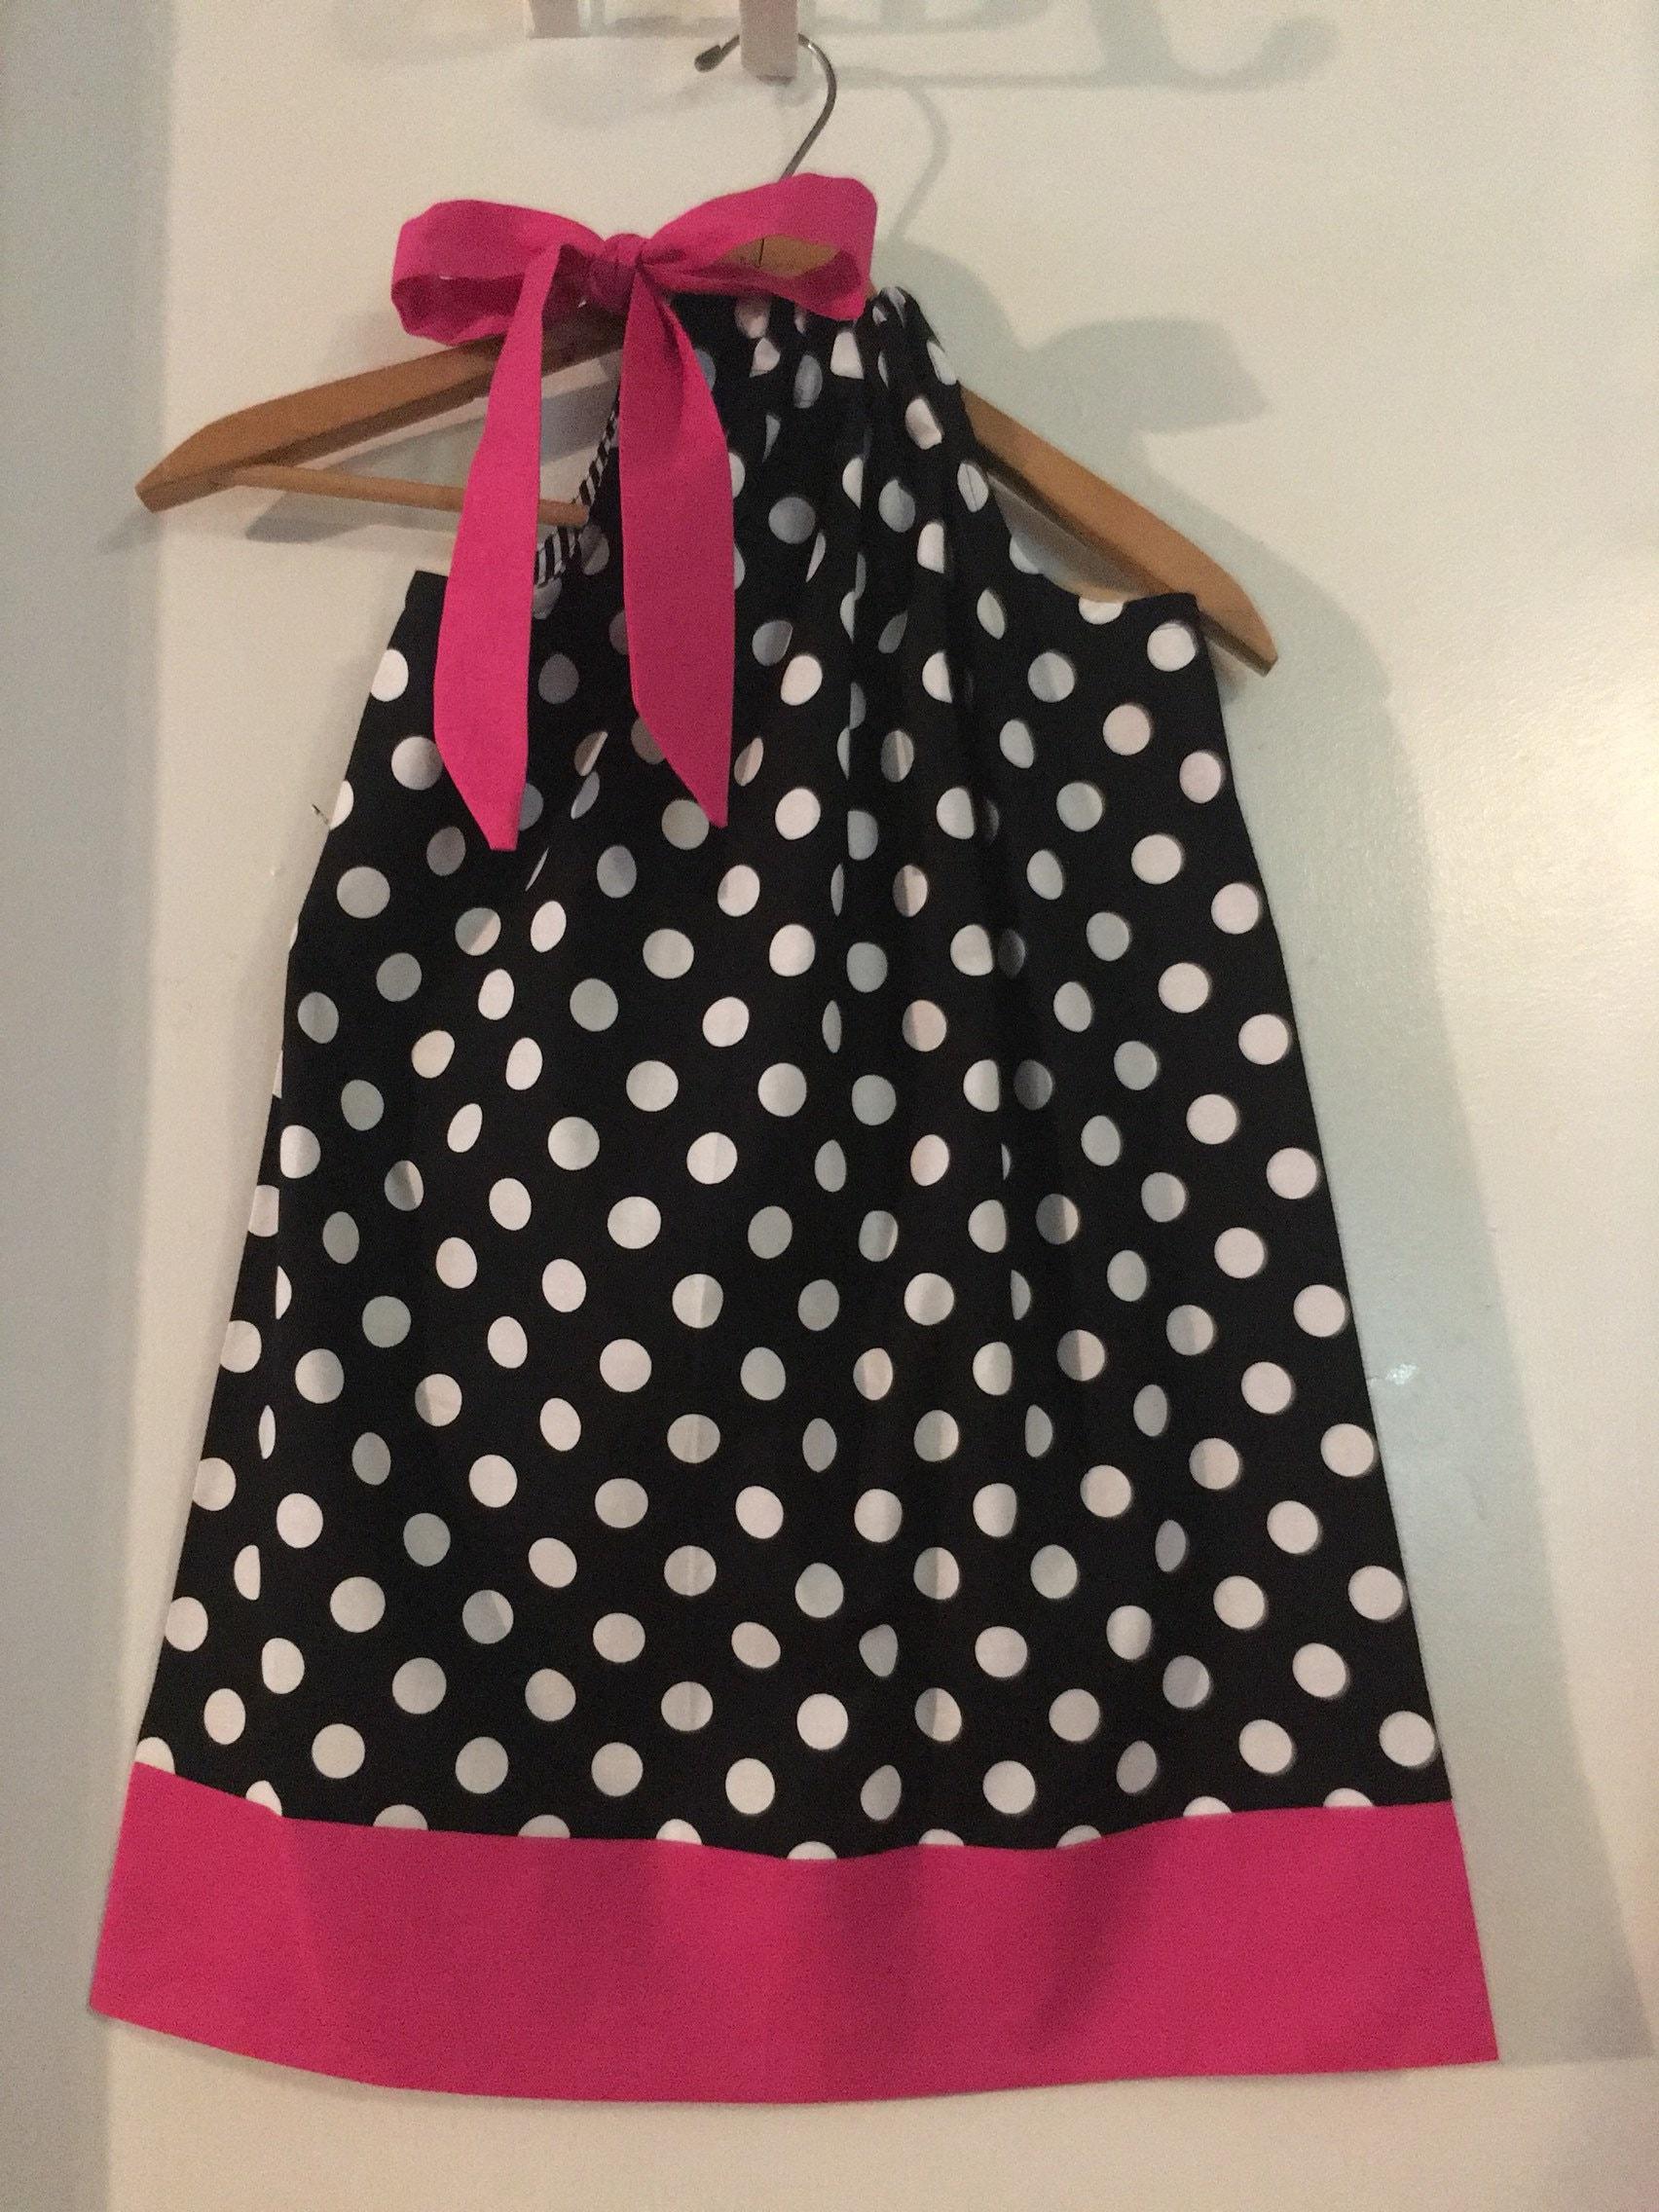 3e2224a65661 Black dots dress Pink back dress Polka dots dress | Etsy